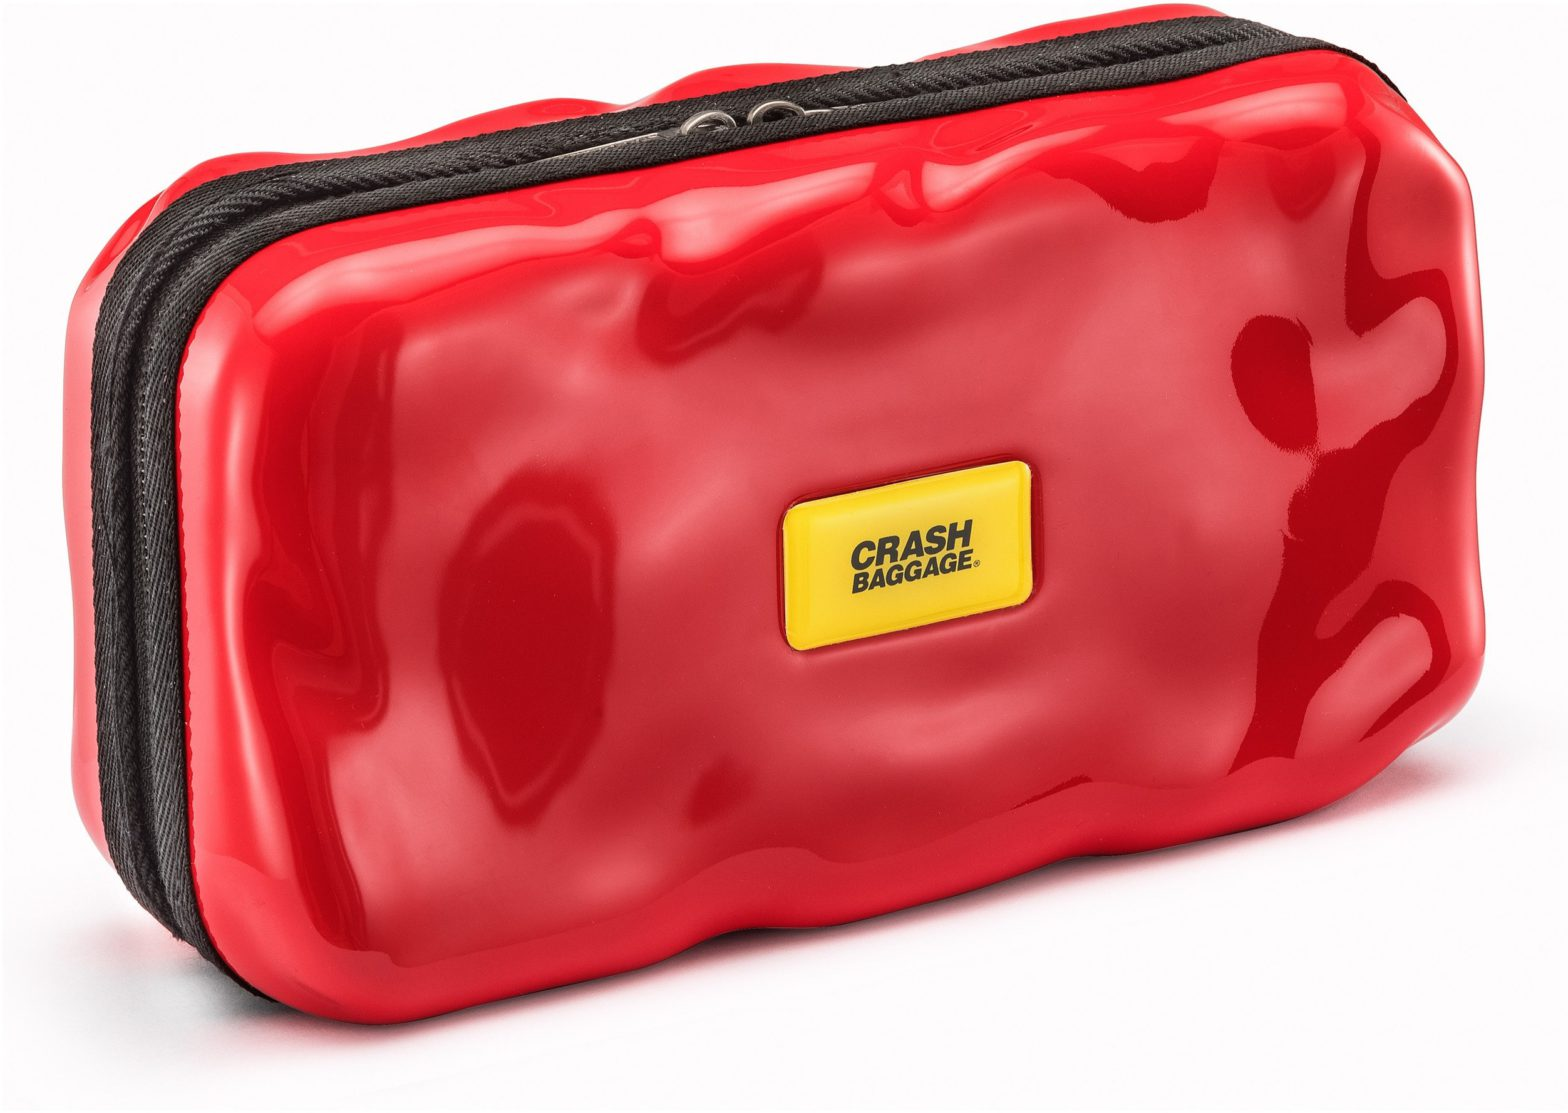 Crash Baggage Kosmetyczka Crash Baggage Red CB370.11